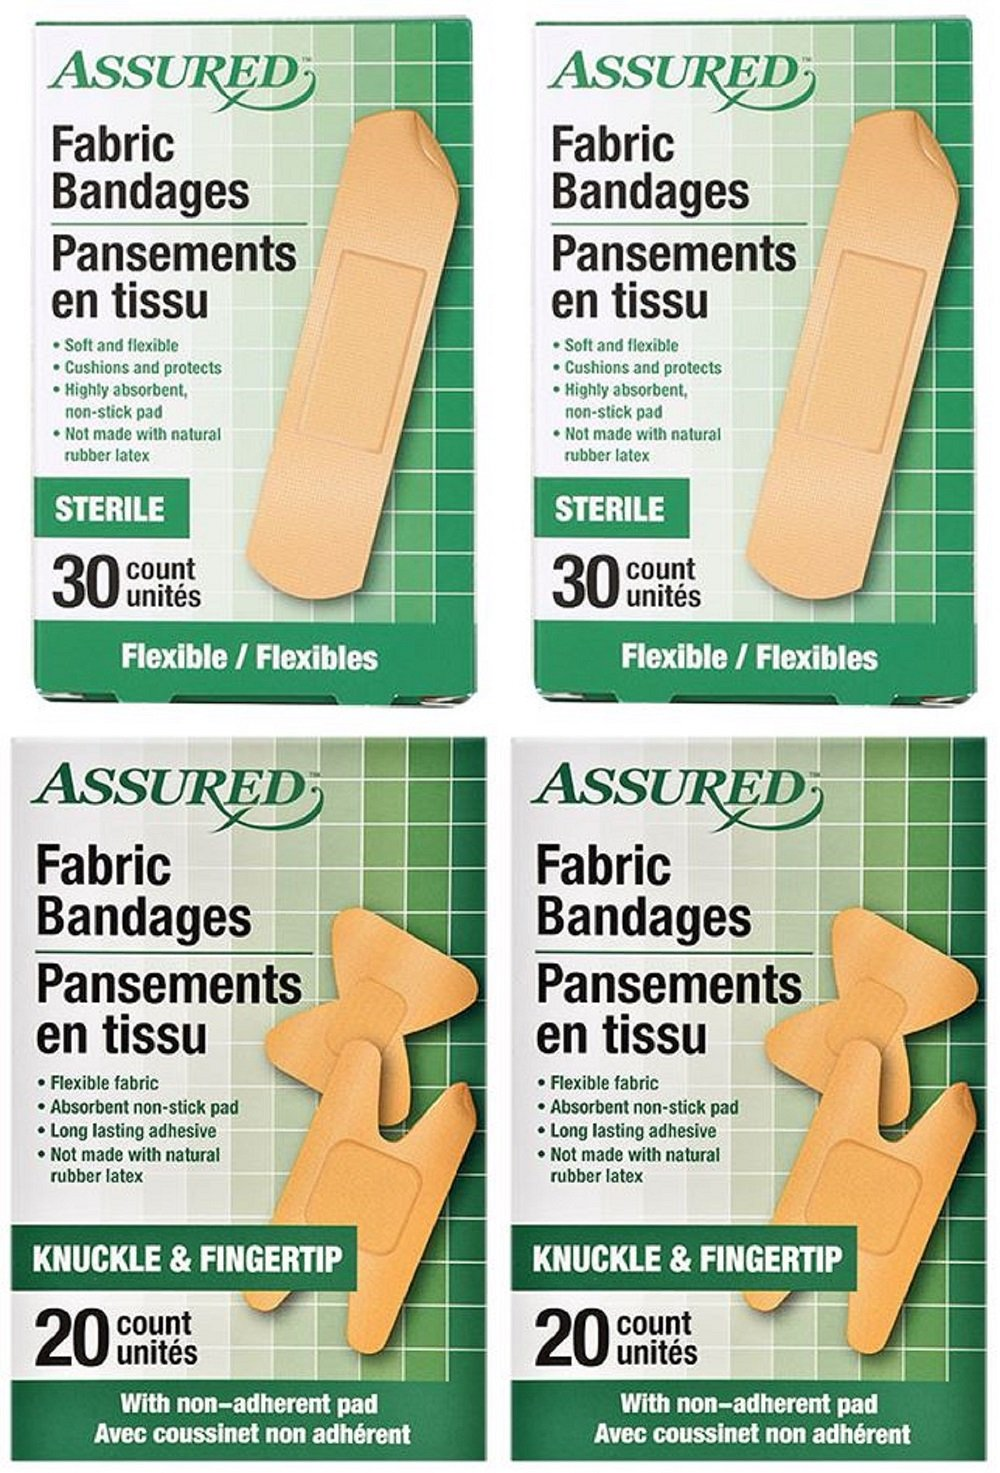 Assured Assorted Flexible Fabric Bandages, Knuckle, Fingertip, Standard, 4-Box, 100-ct